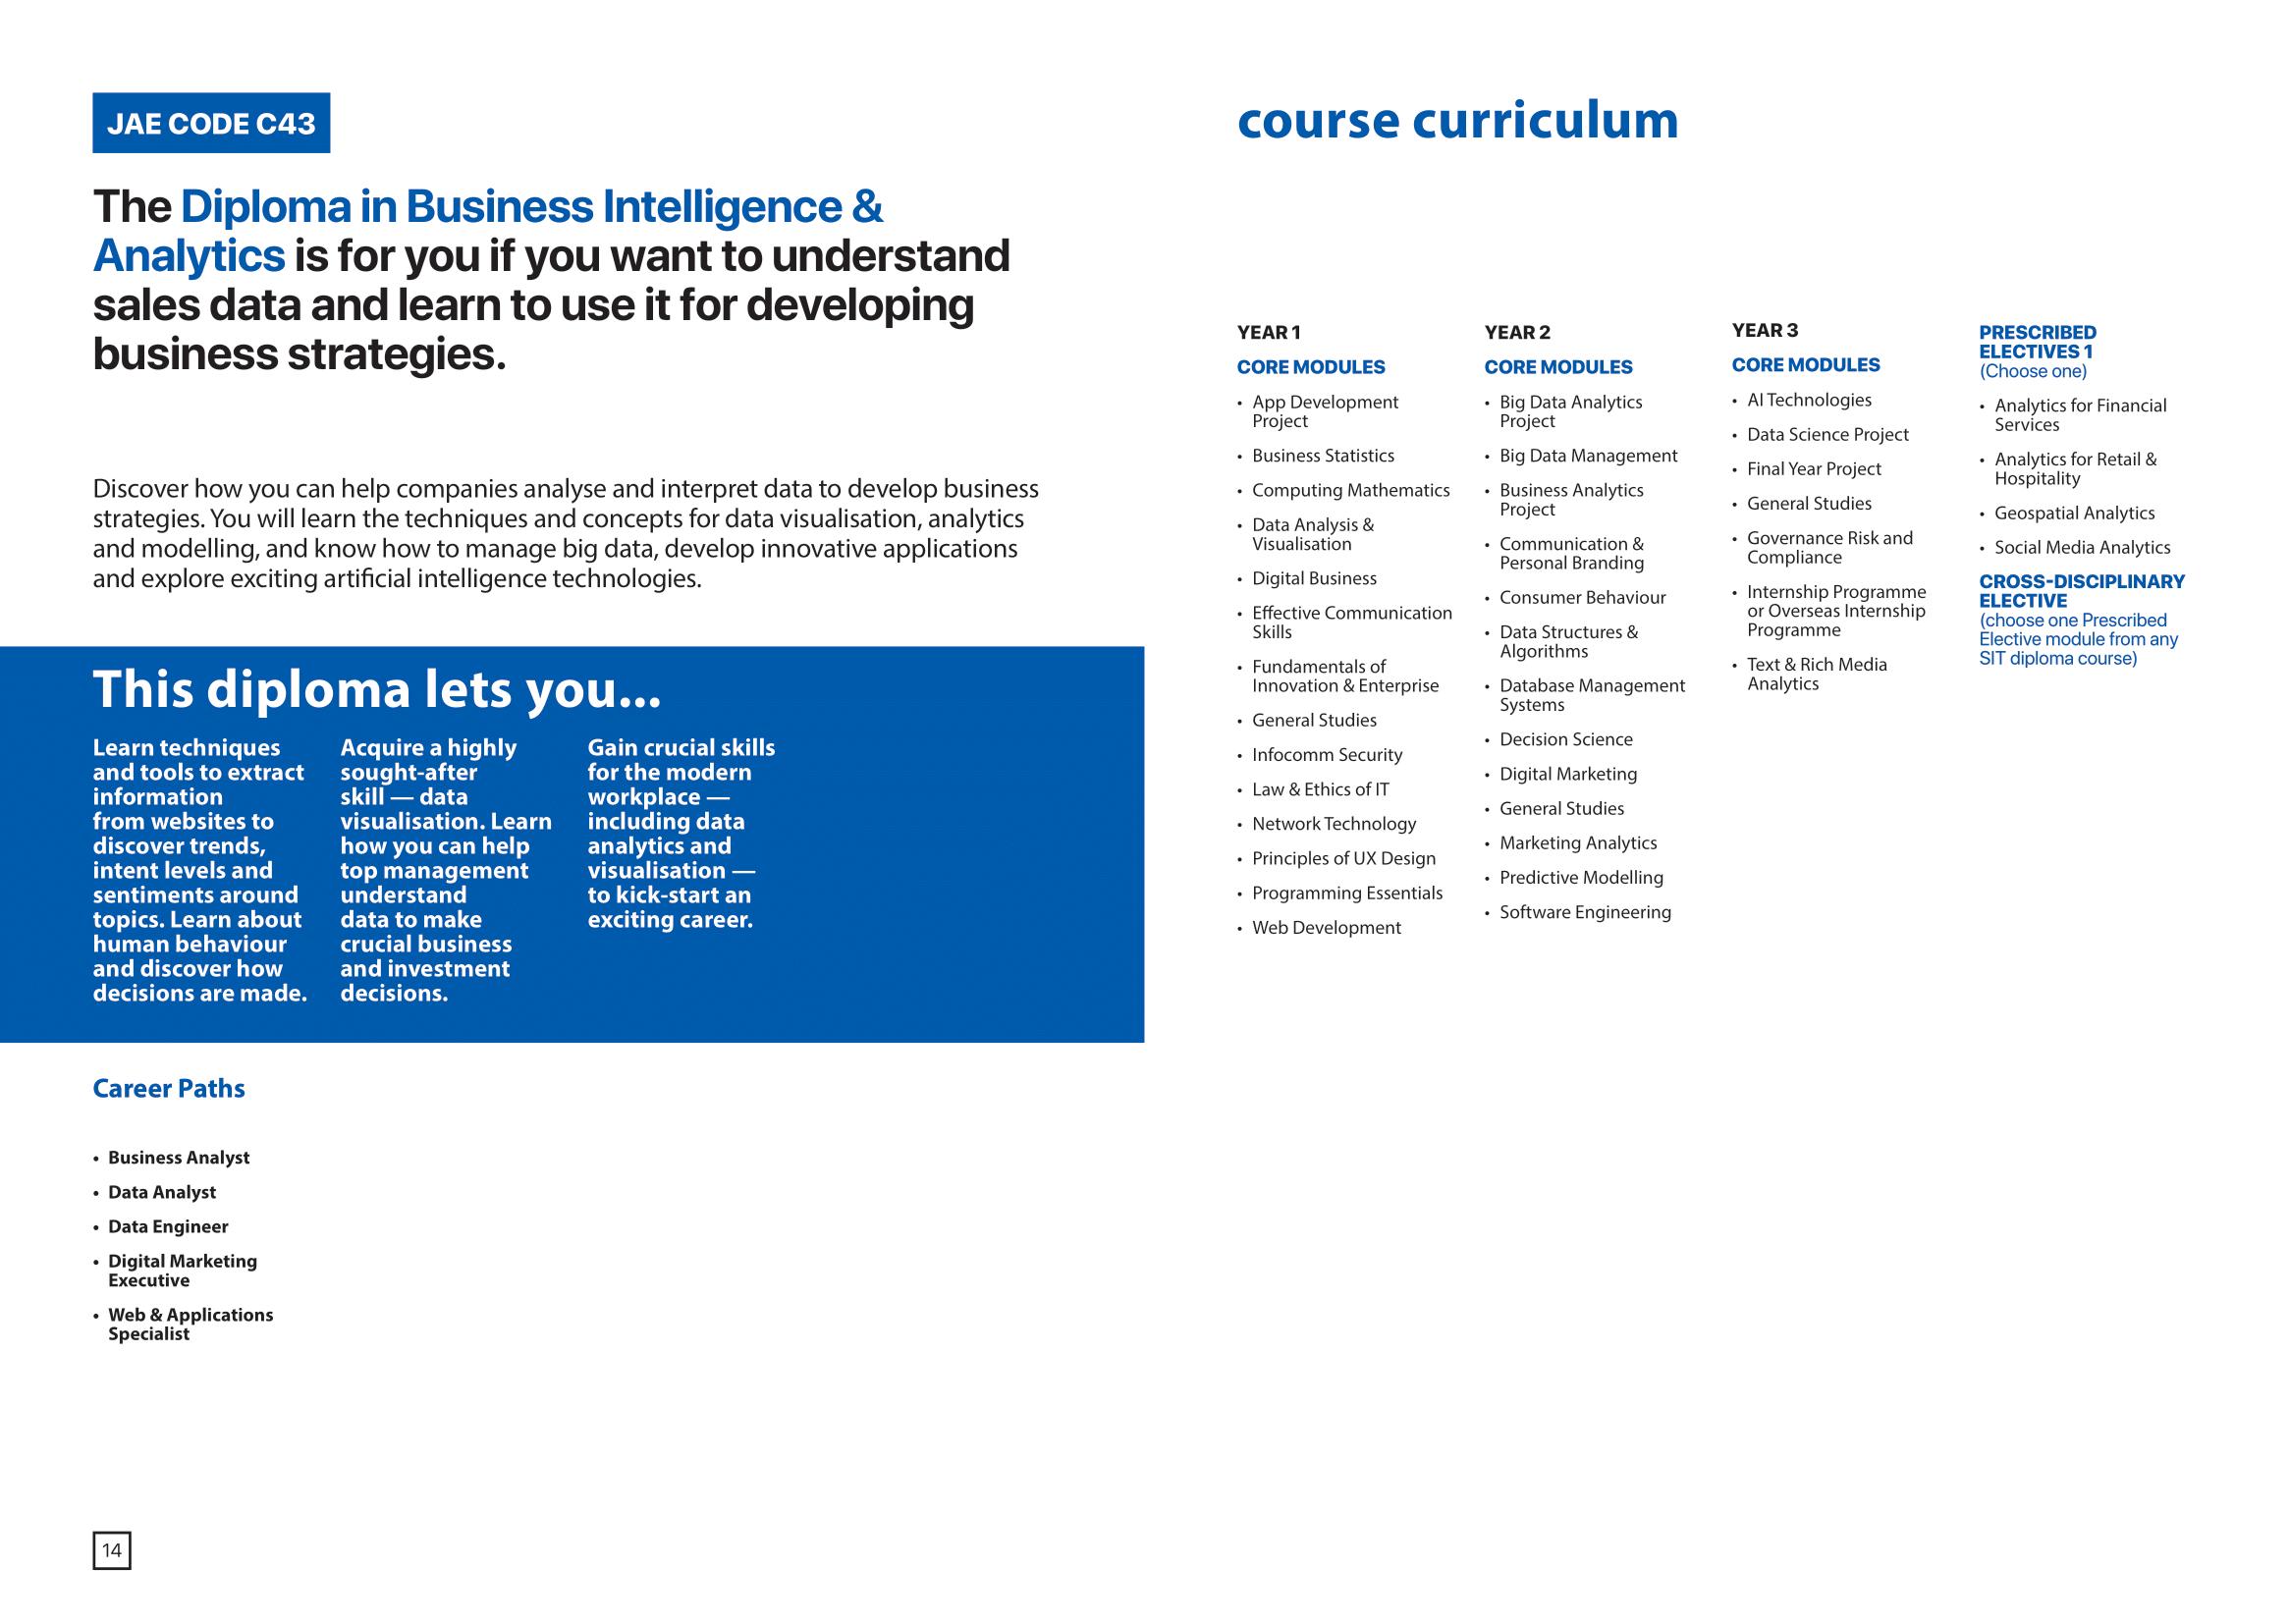 School of Information Technology 2020-09